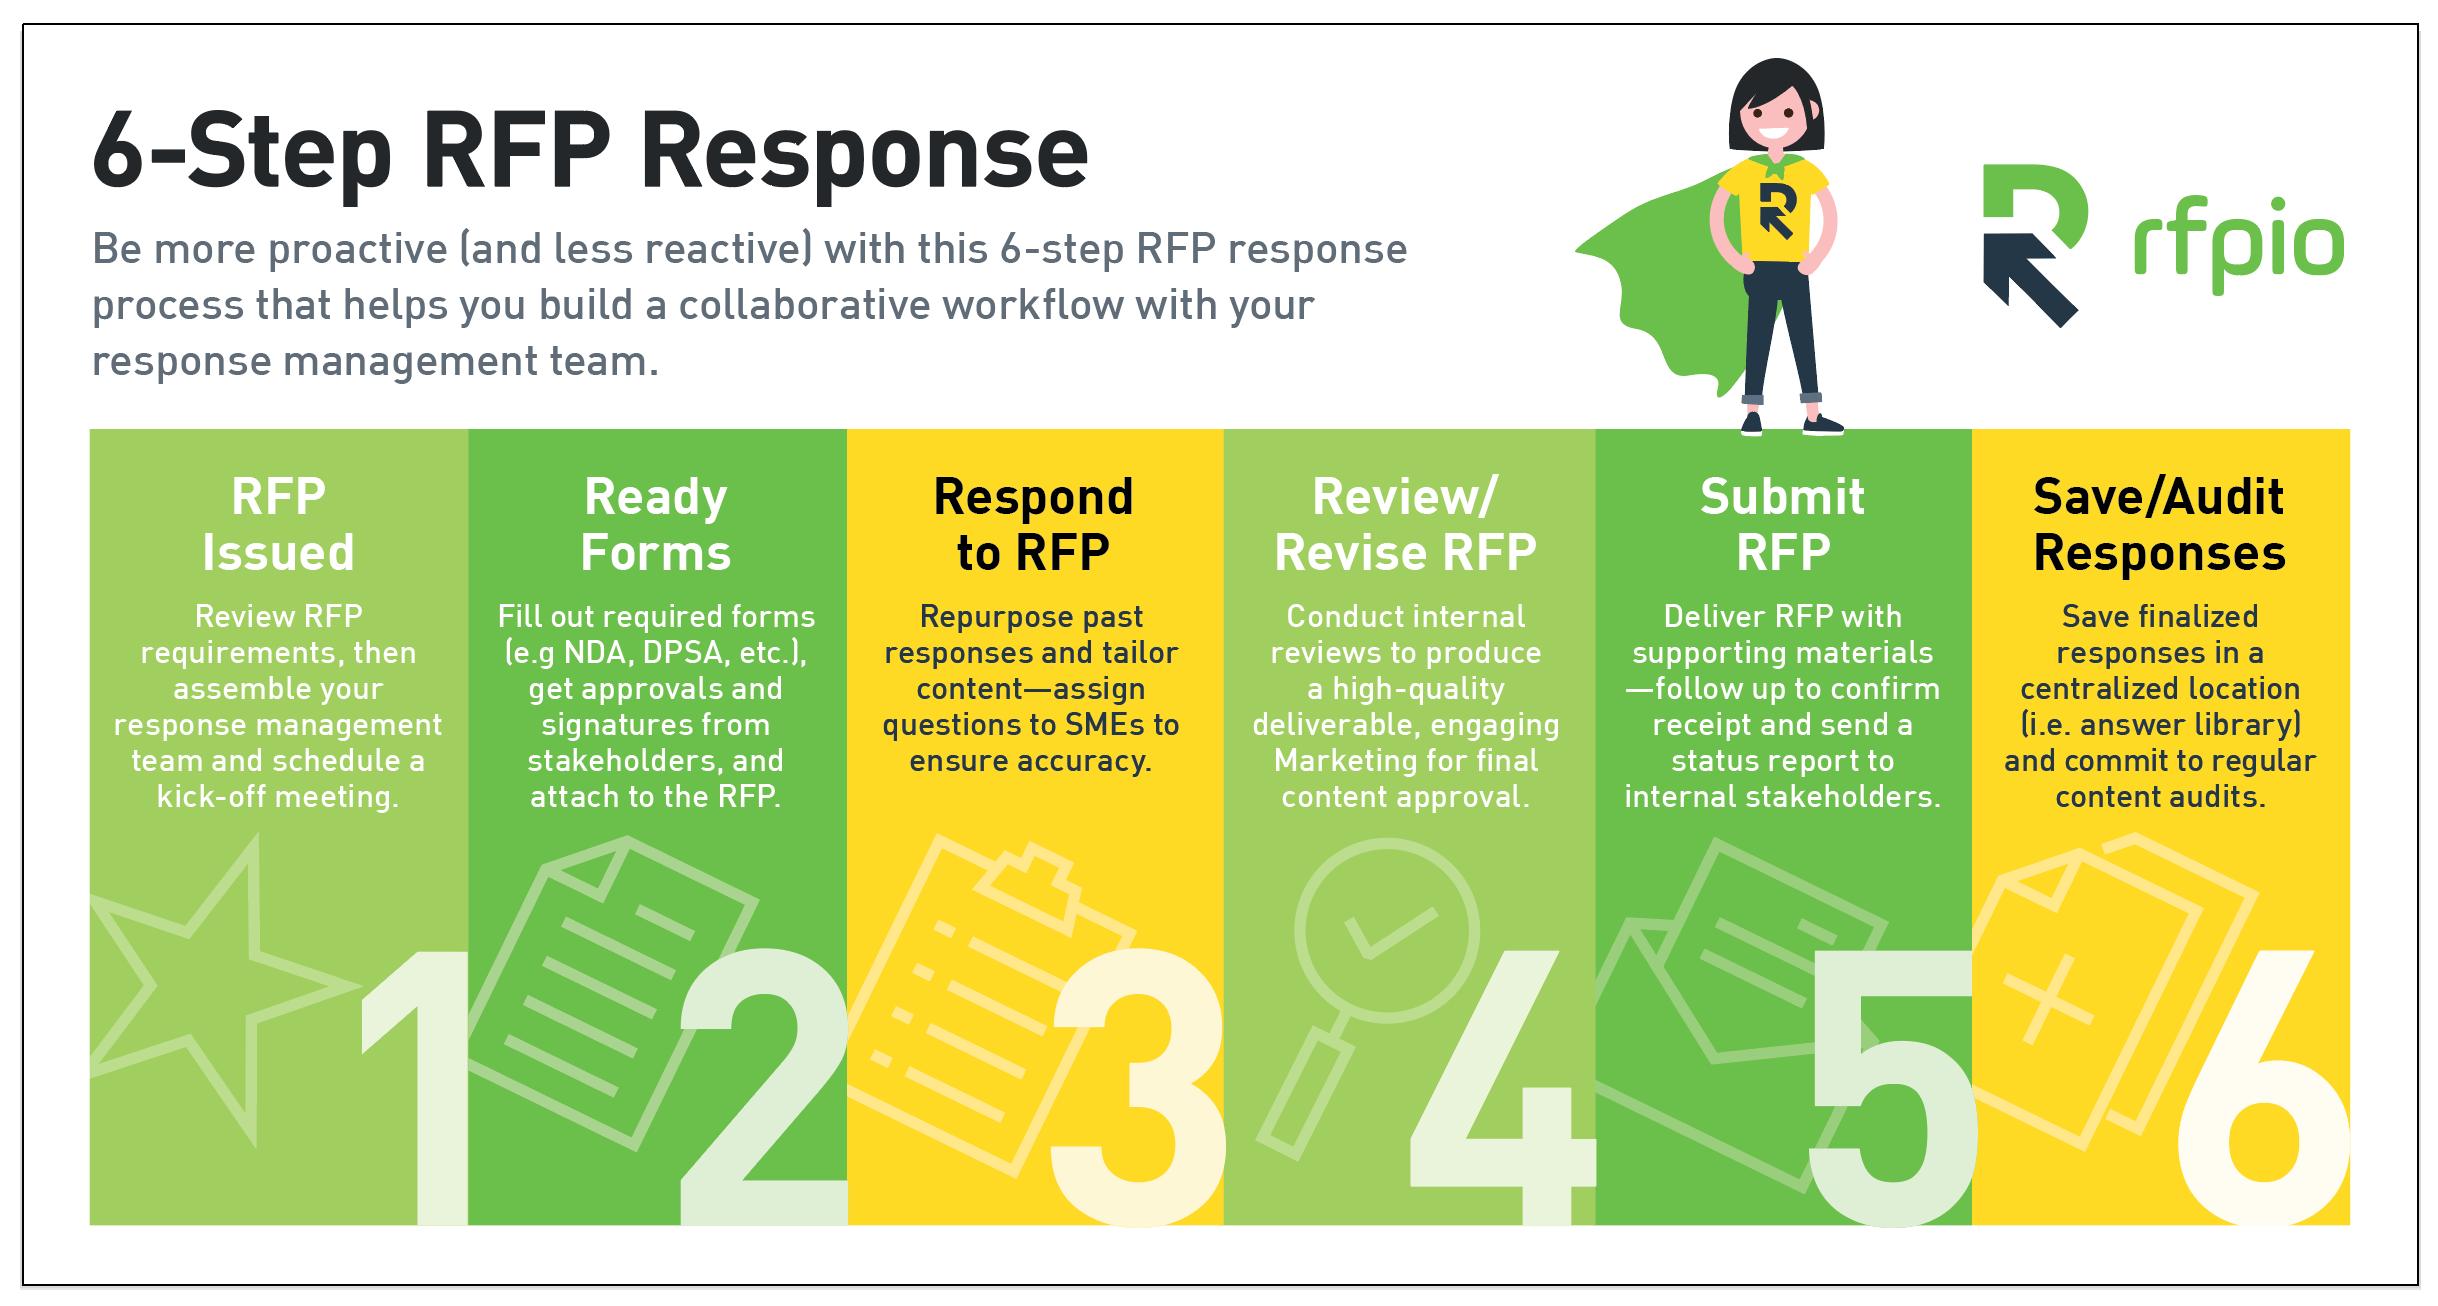 6-Step RFP Response Process